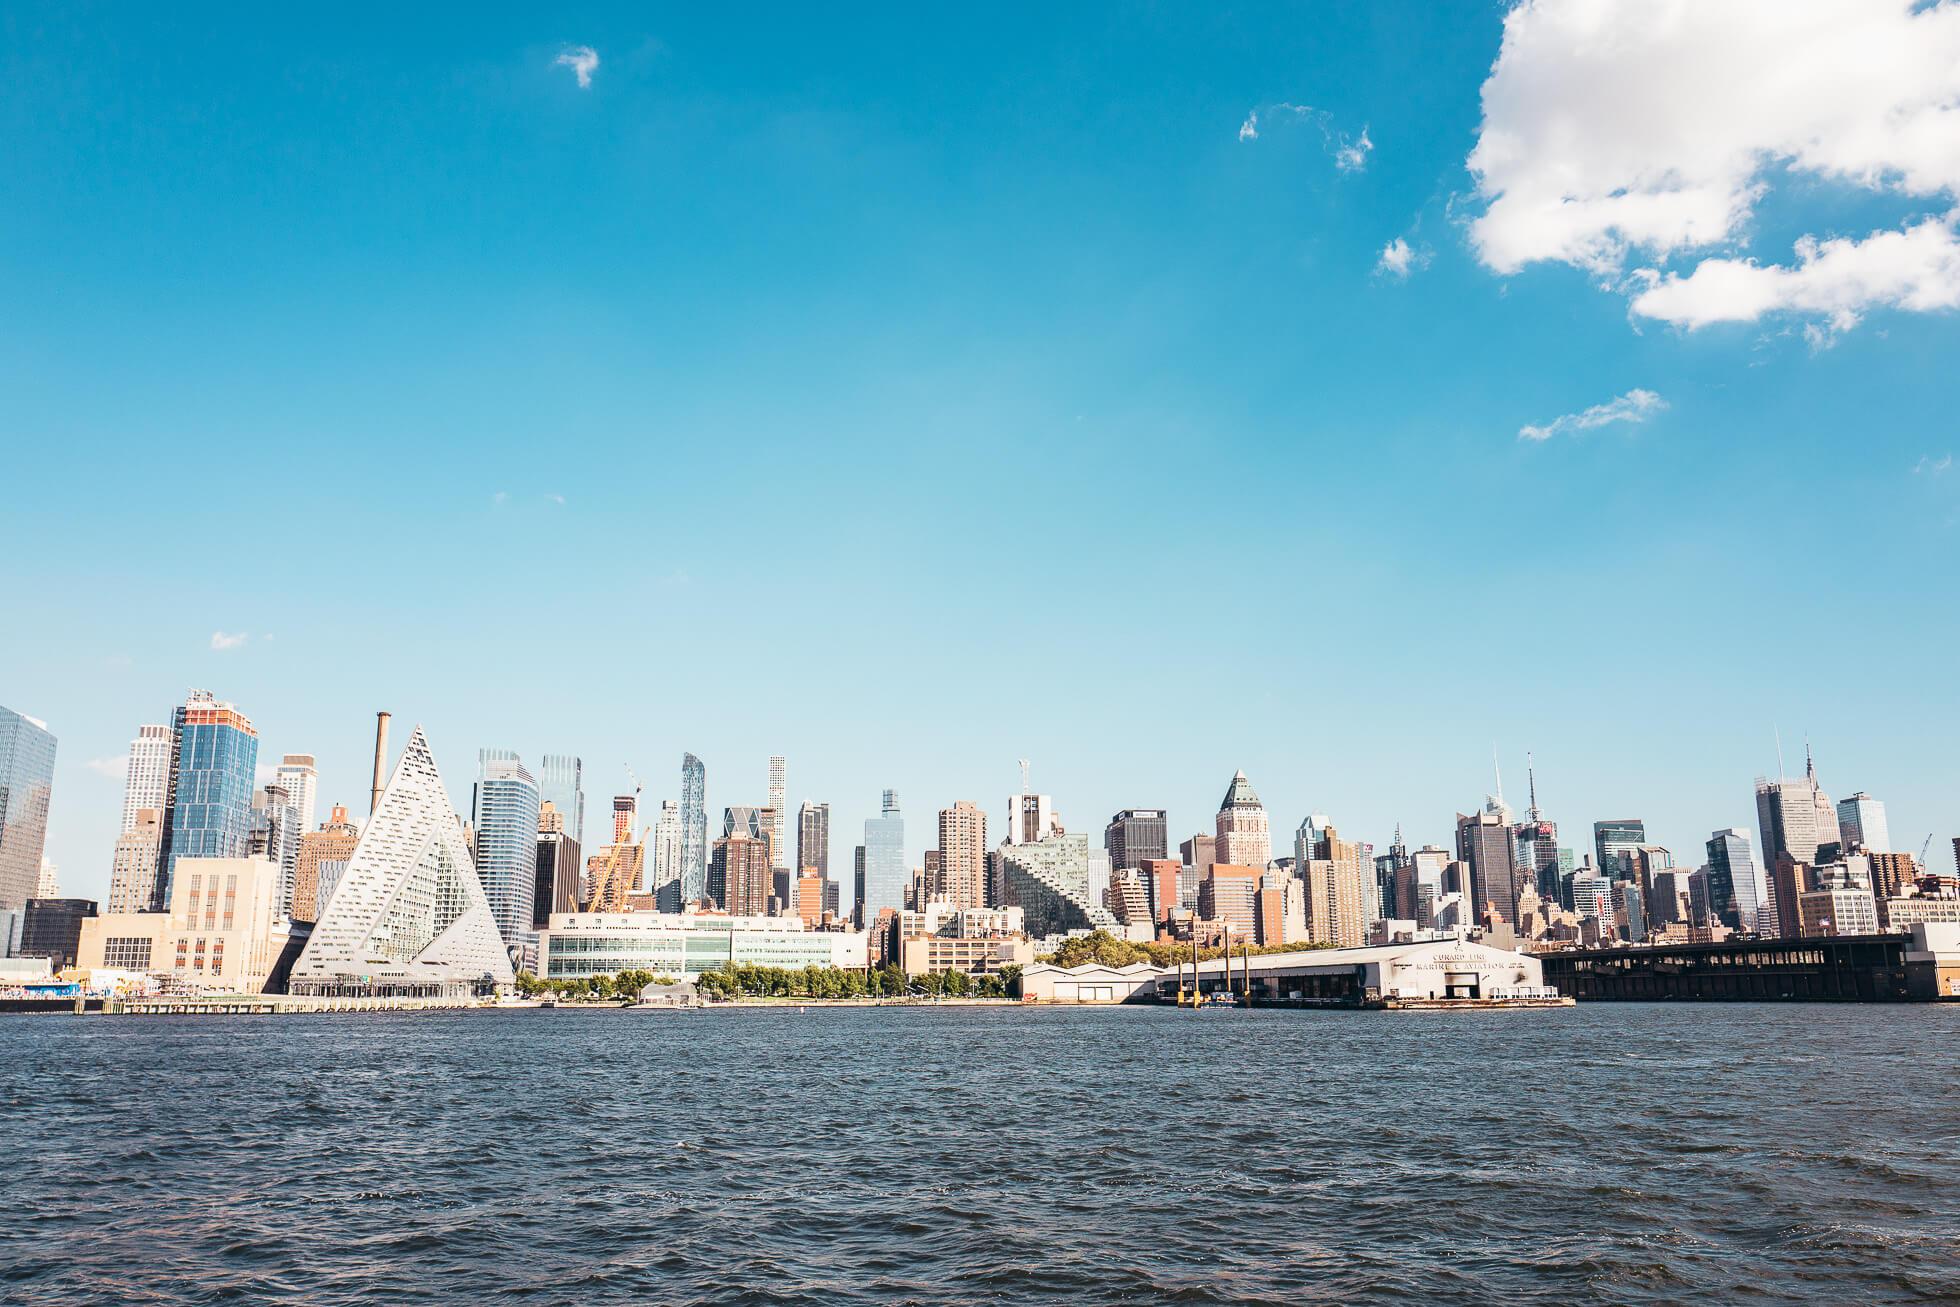 janni-deler-new-york-tour-boatL1090499